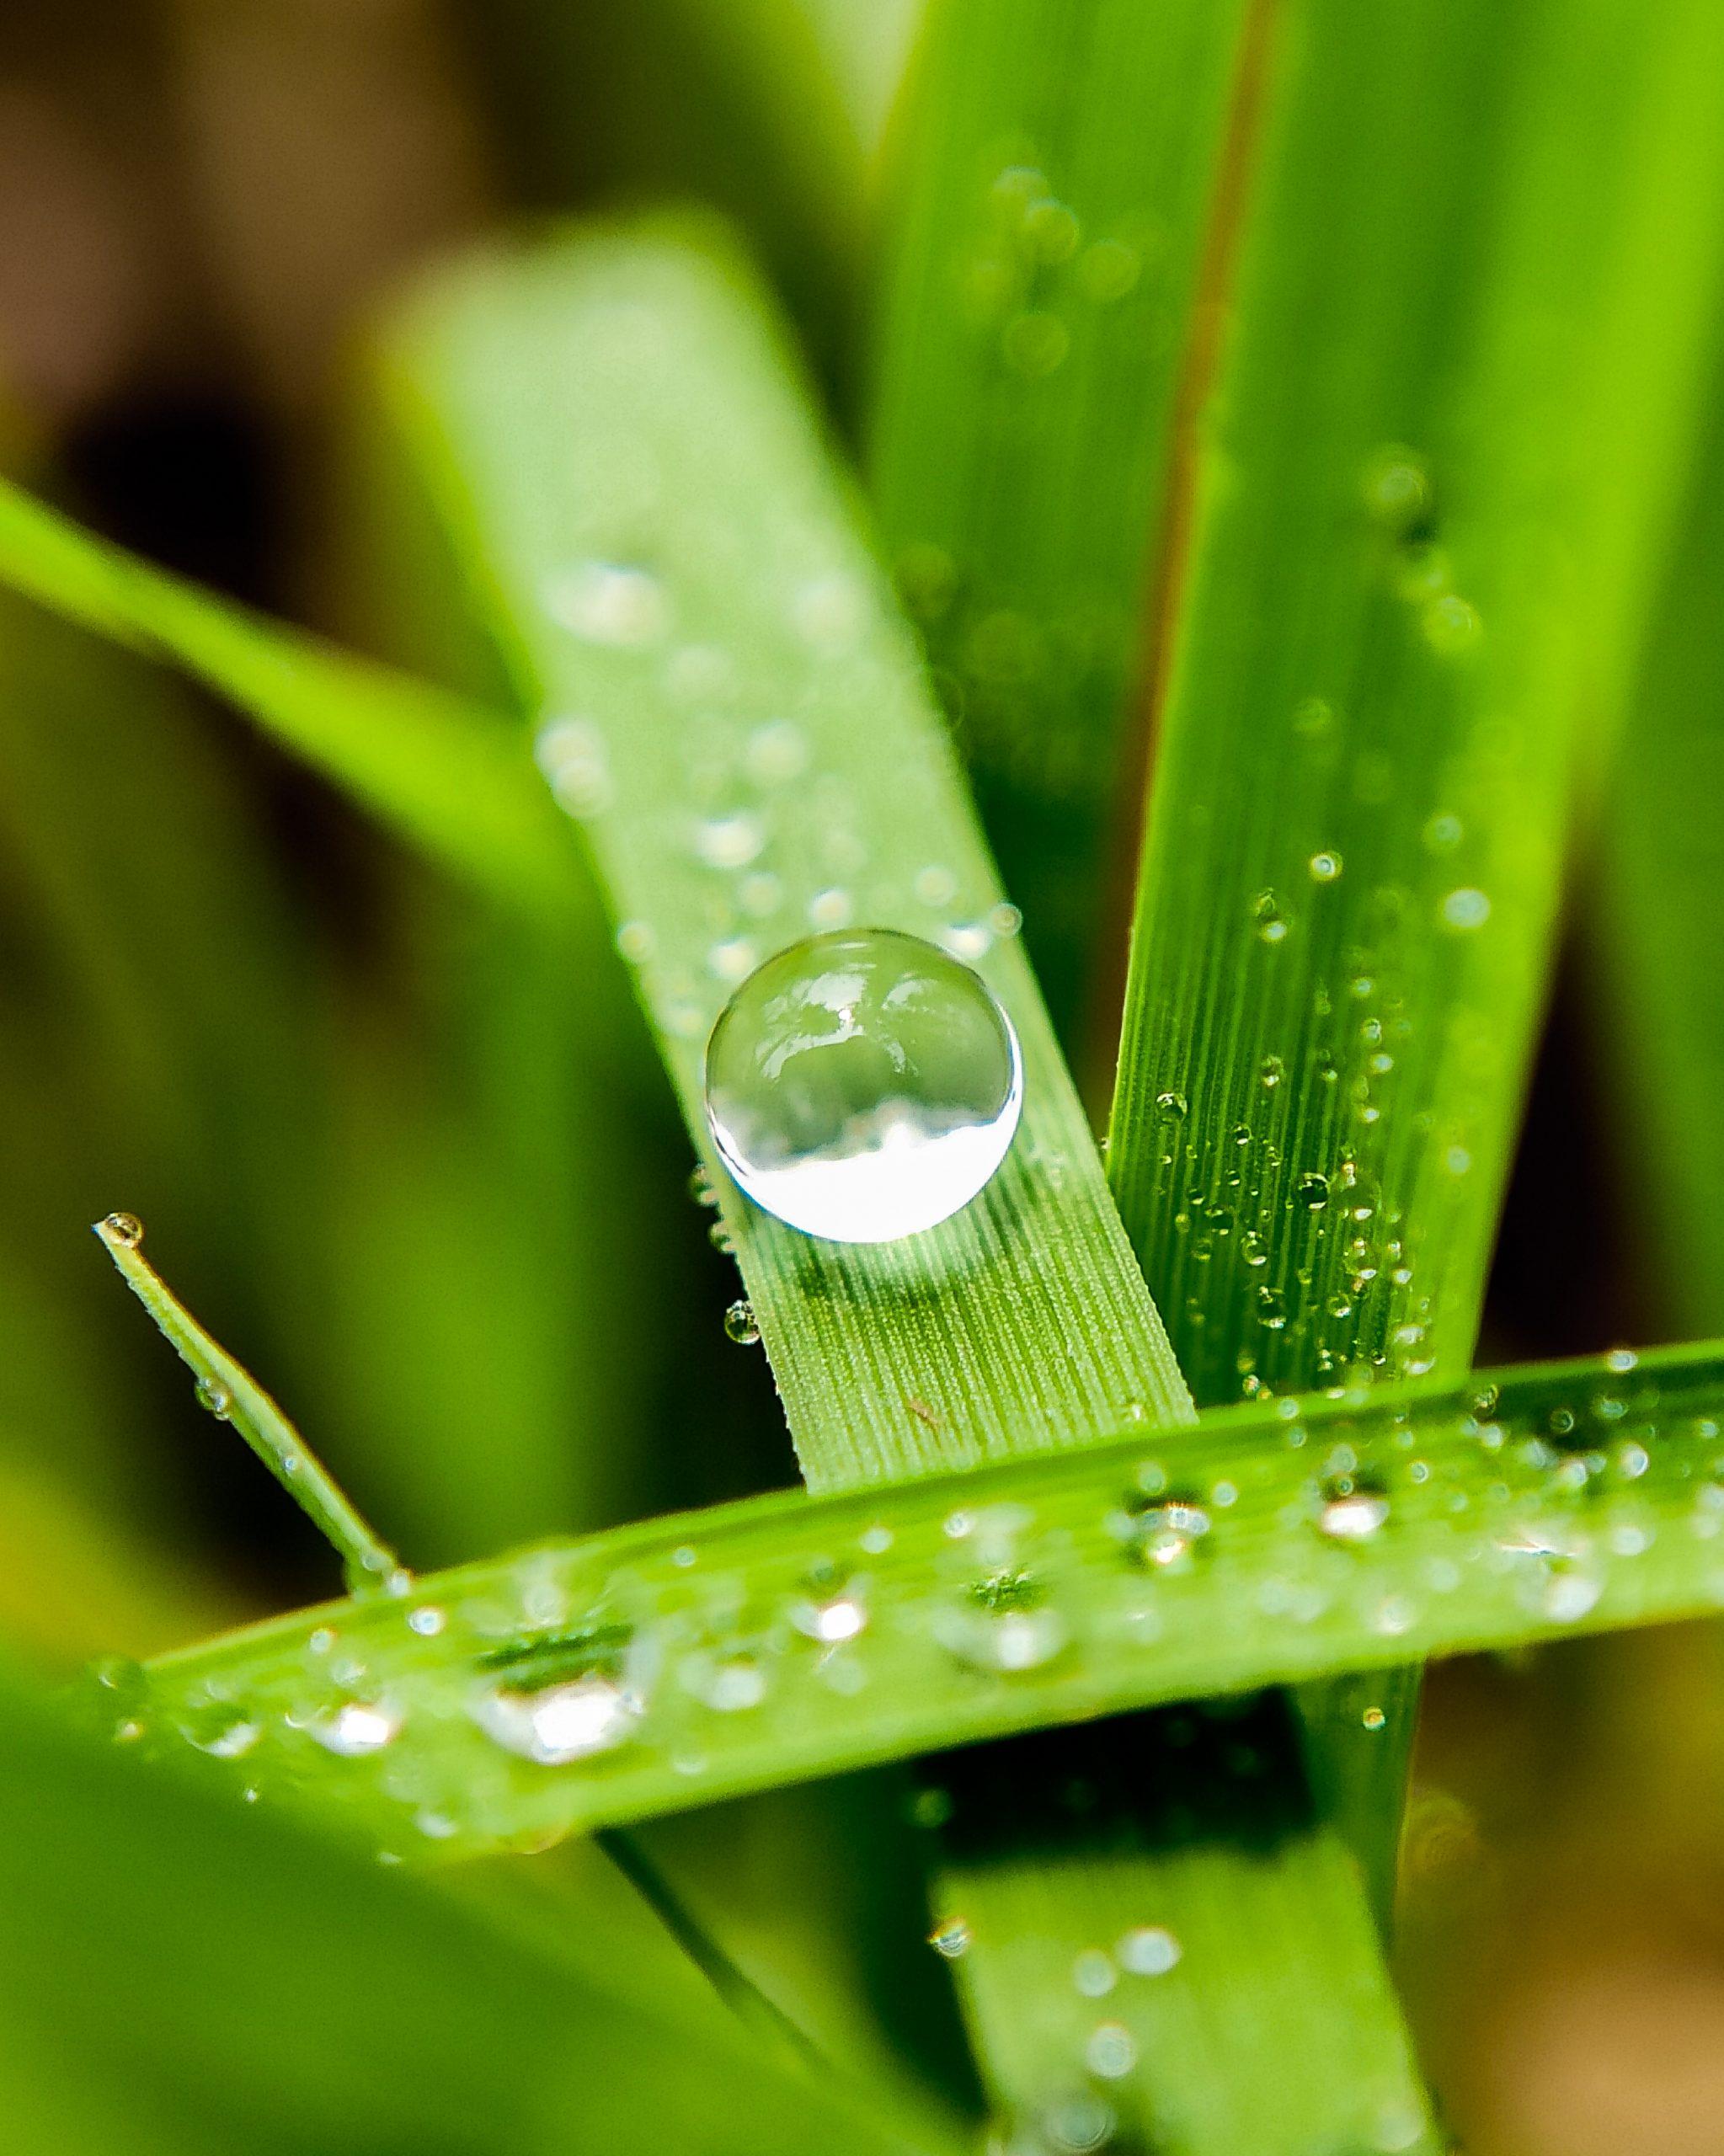 Dew drops on grass straws